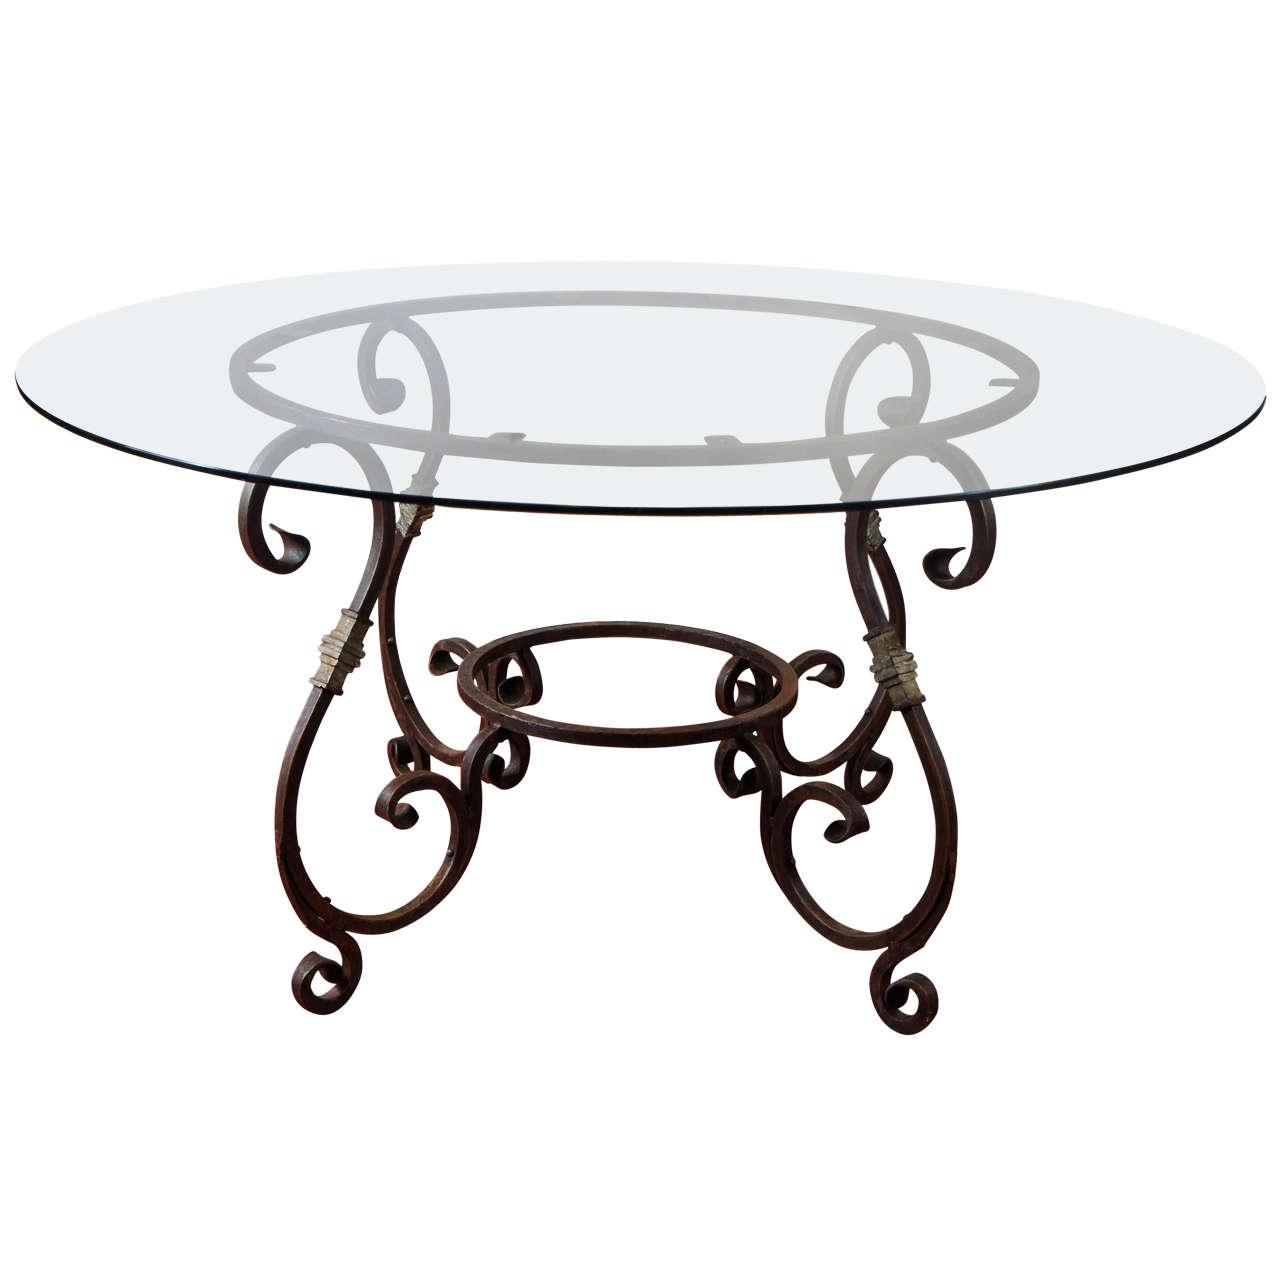 Dining Room Table Bases Metal: X.jpg